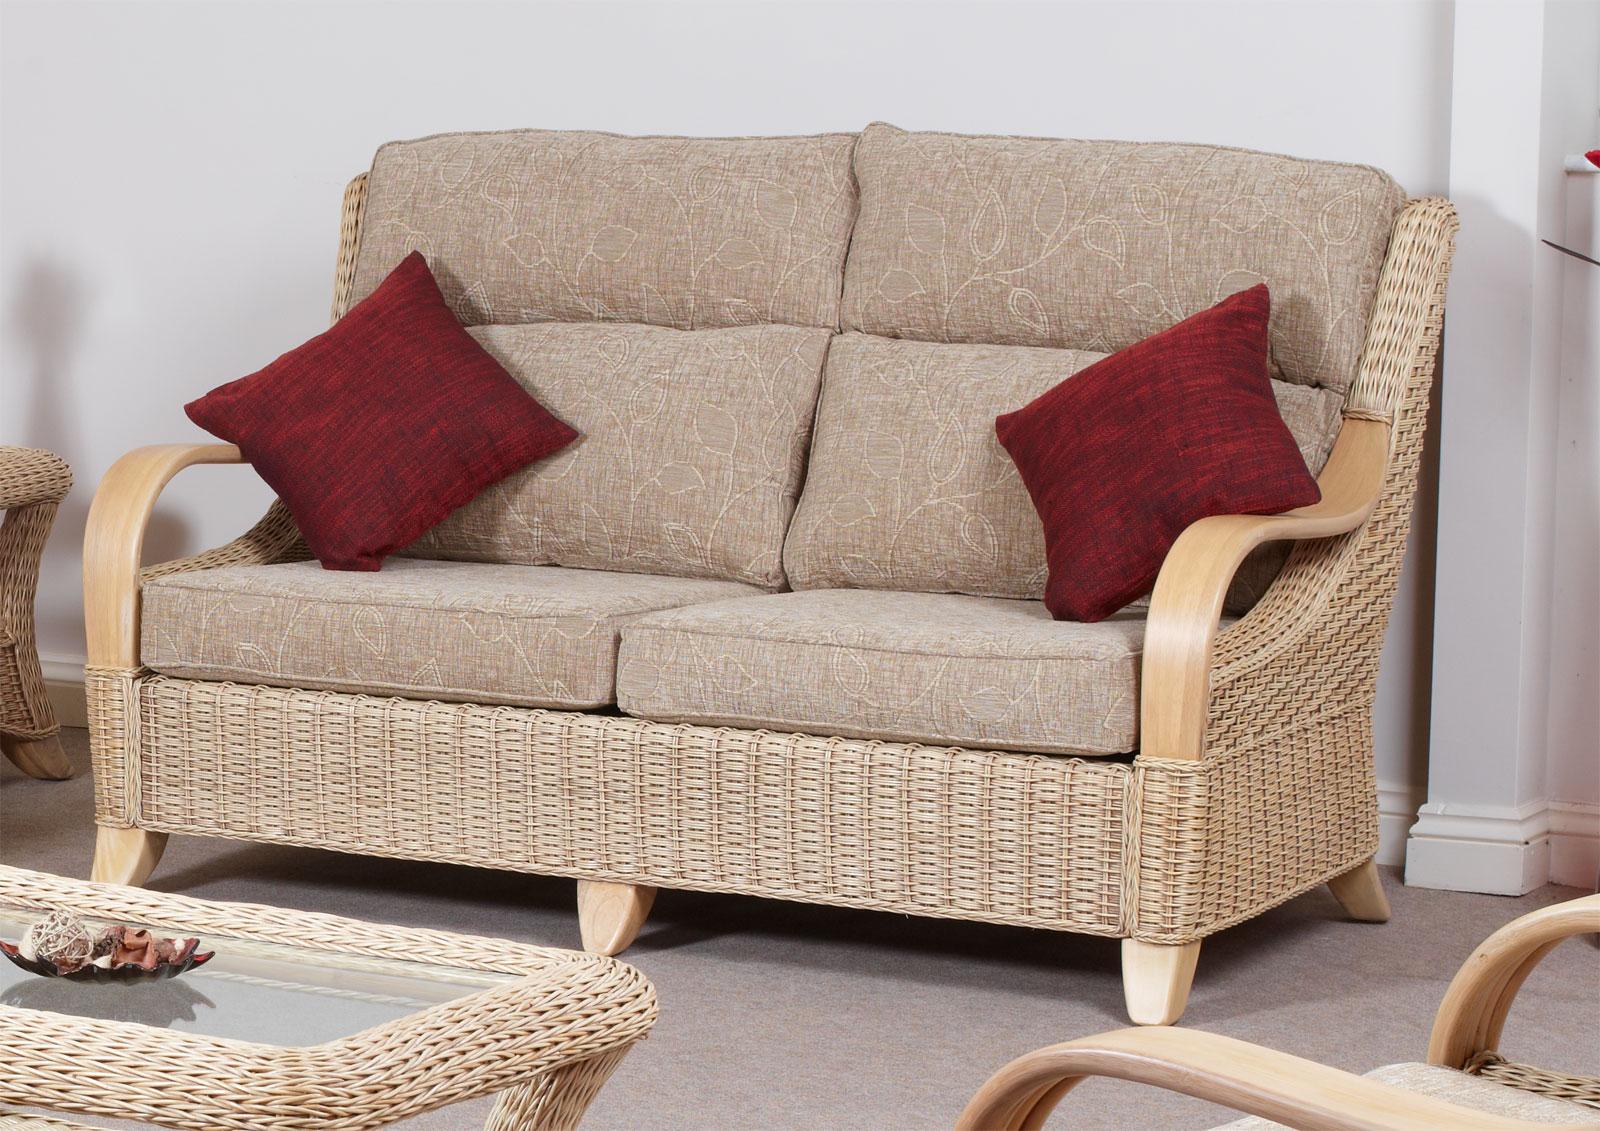 Hilton Conservatory Cane Furniture Large Wicker Sofa